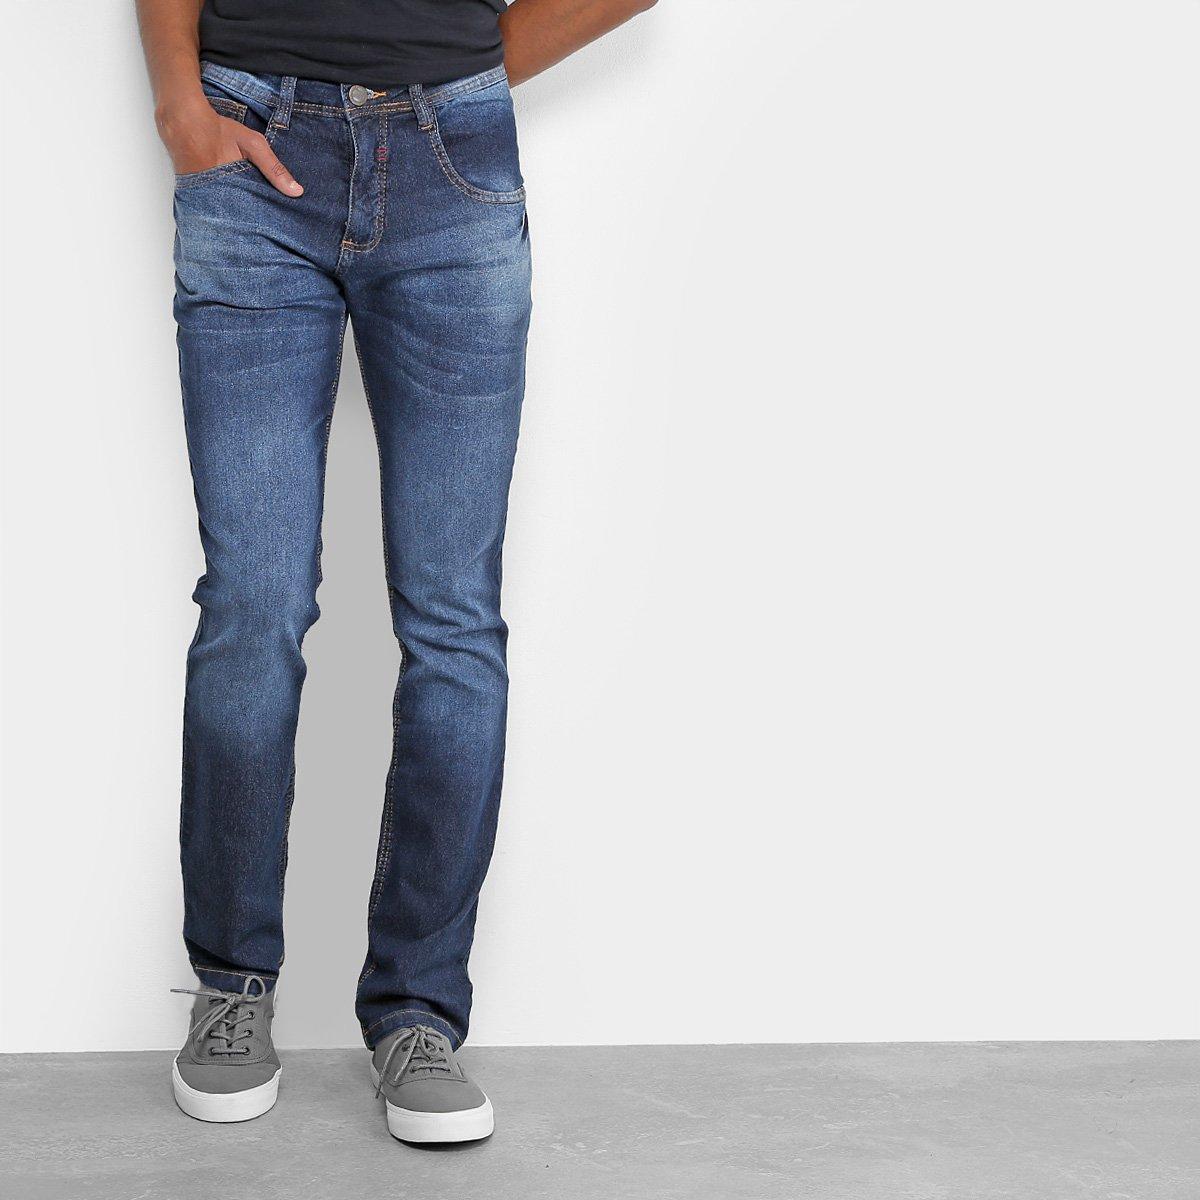 Calça Jeans Slim Biotipo Estonada Masculina - Compre Agora  d5288aae3de